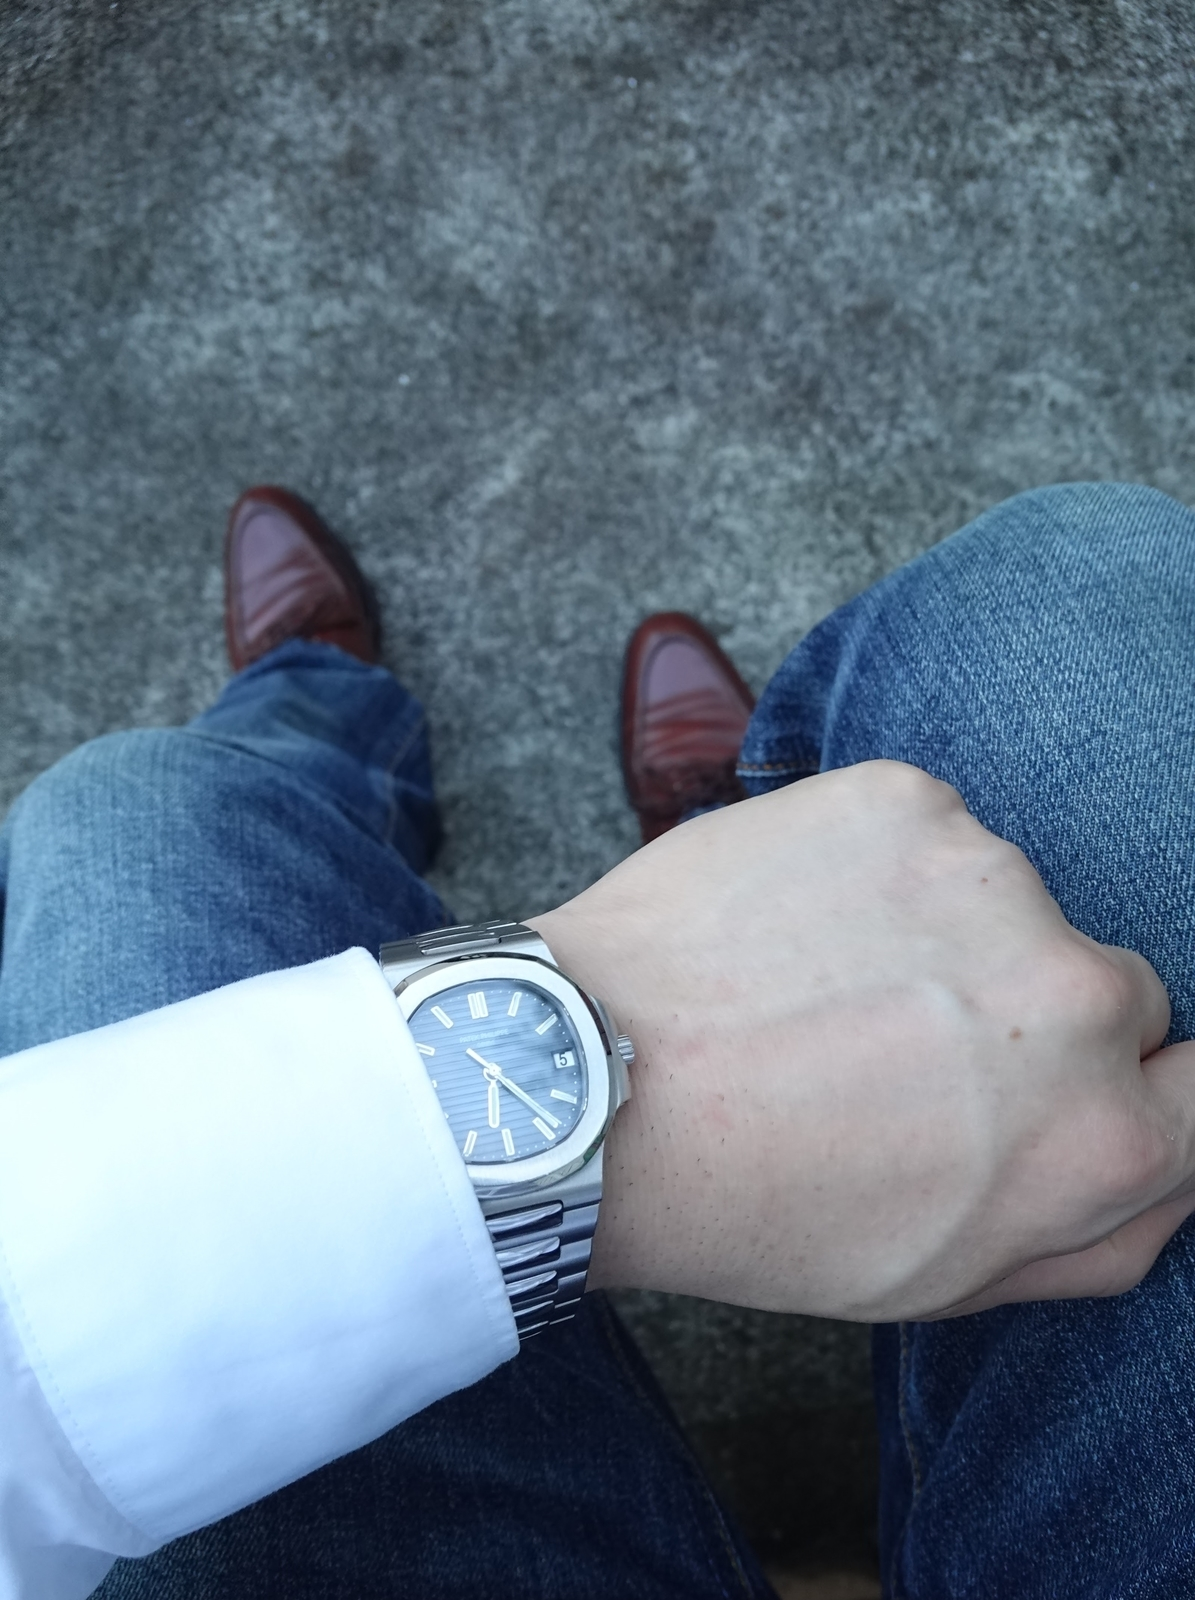 f:id:suits:20200705182222j:plain